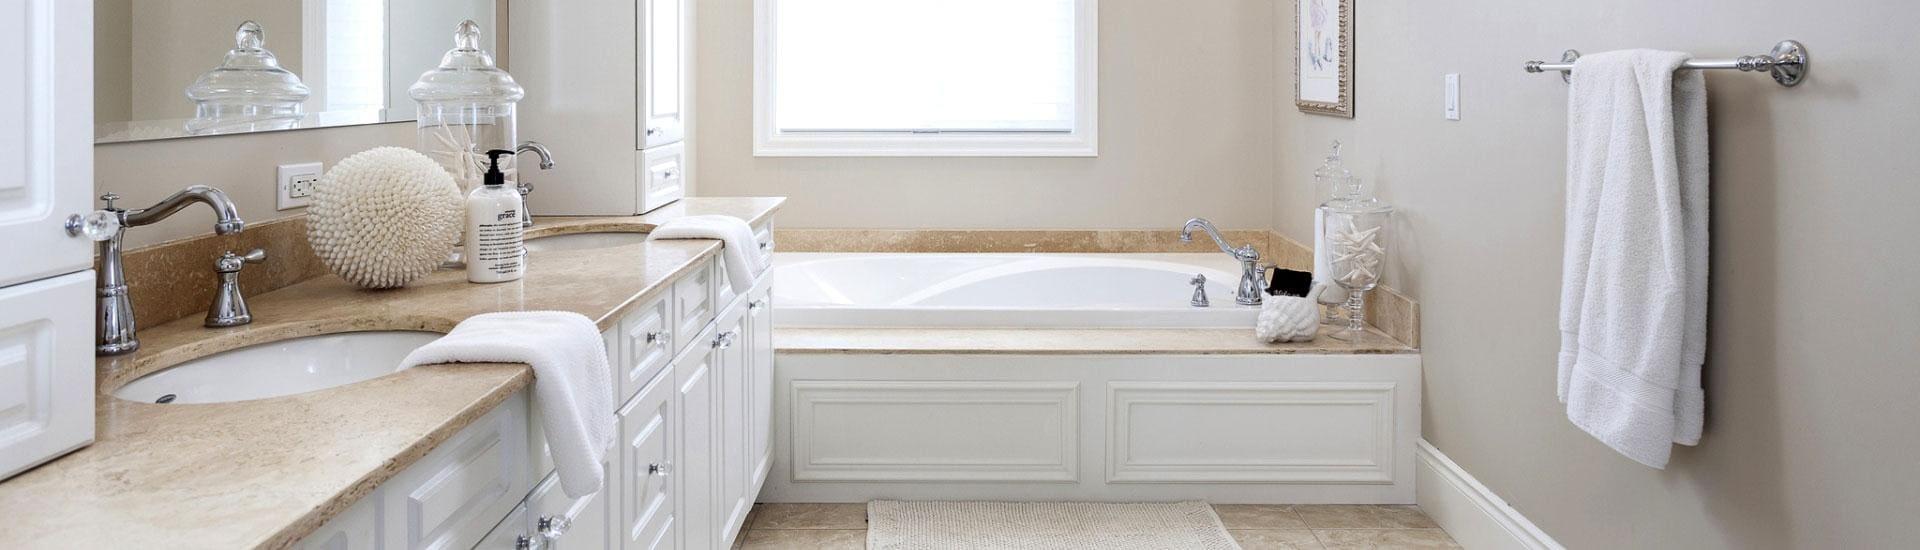 Интерьер ванной комнты